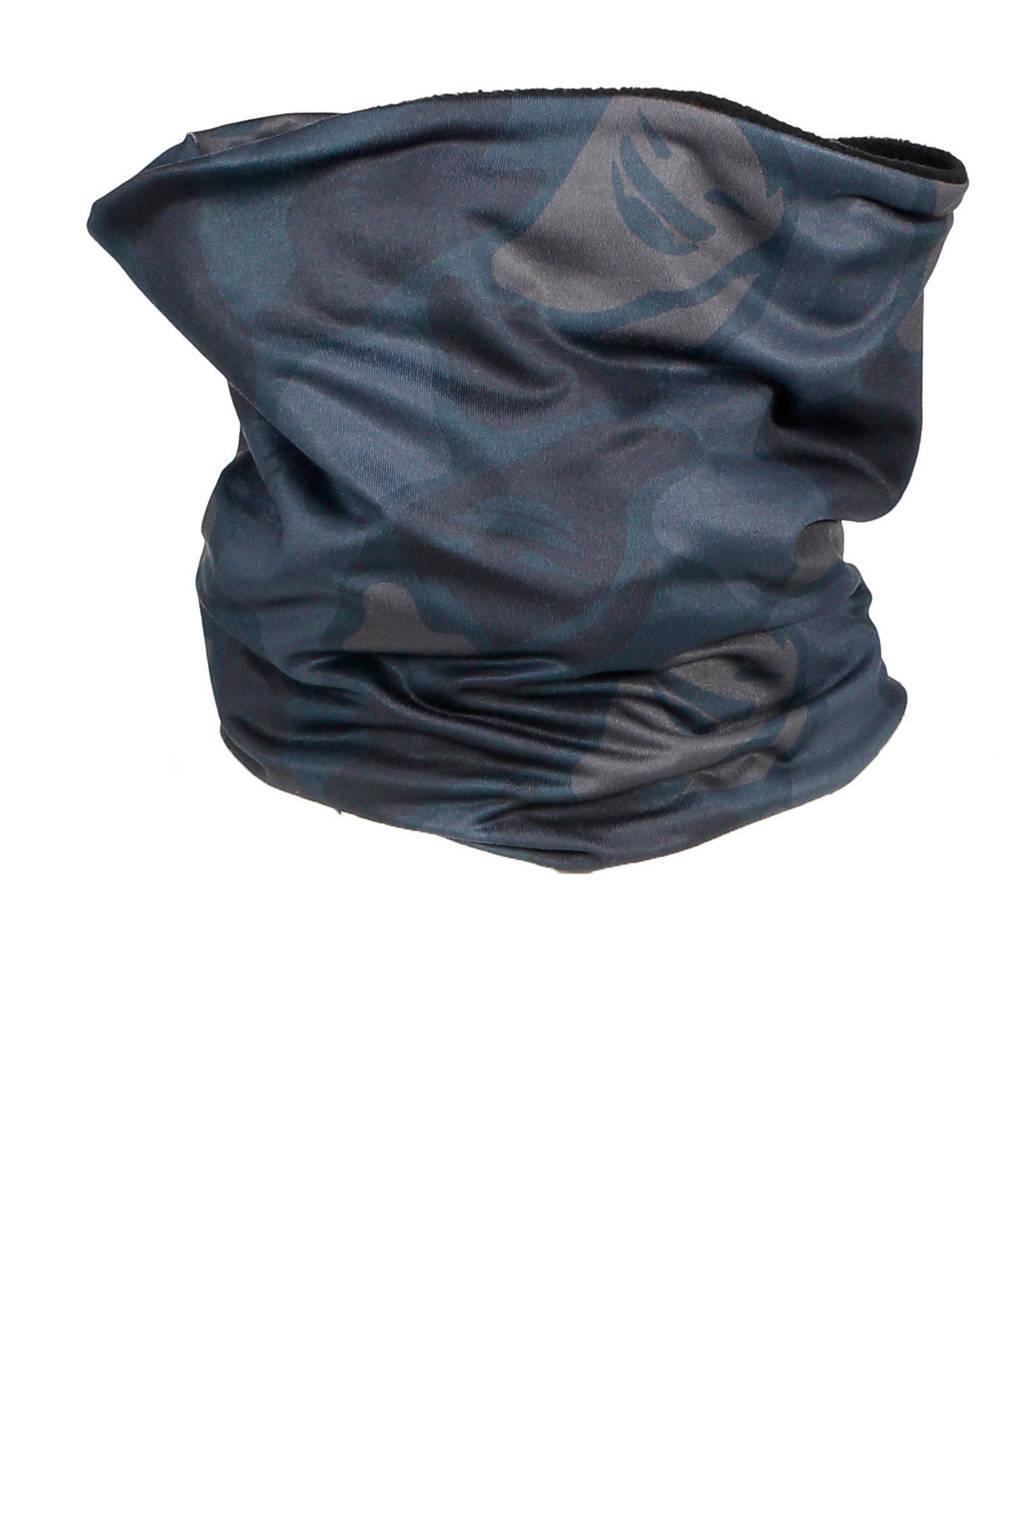 SuperRebel softshell skicoll camouflage, Blauw/grijs camouflage